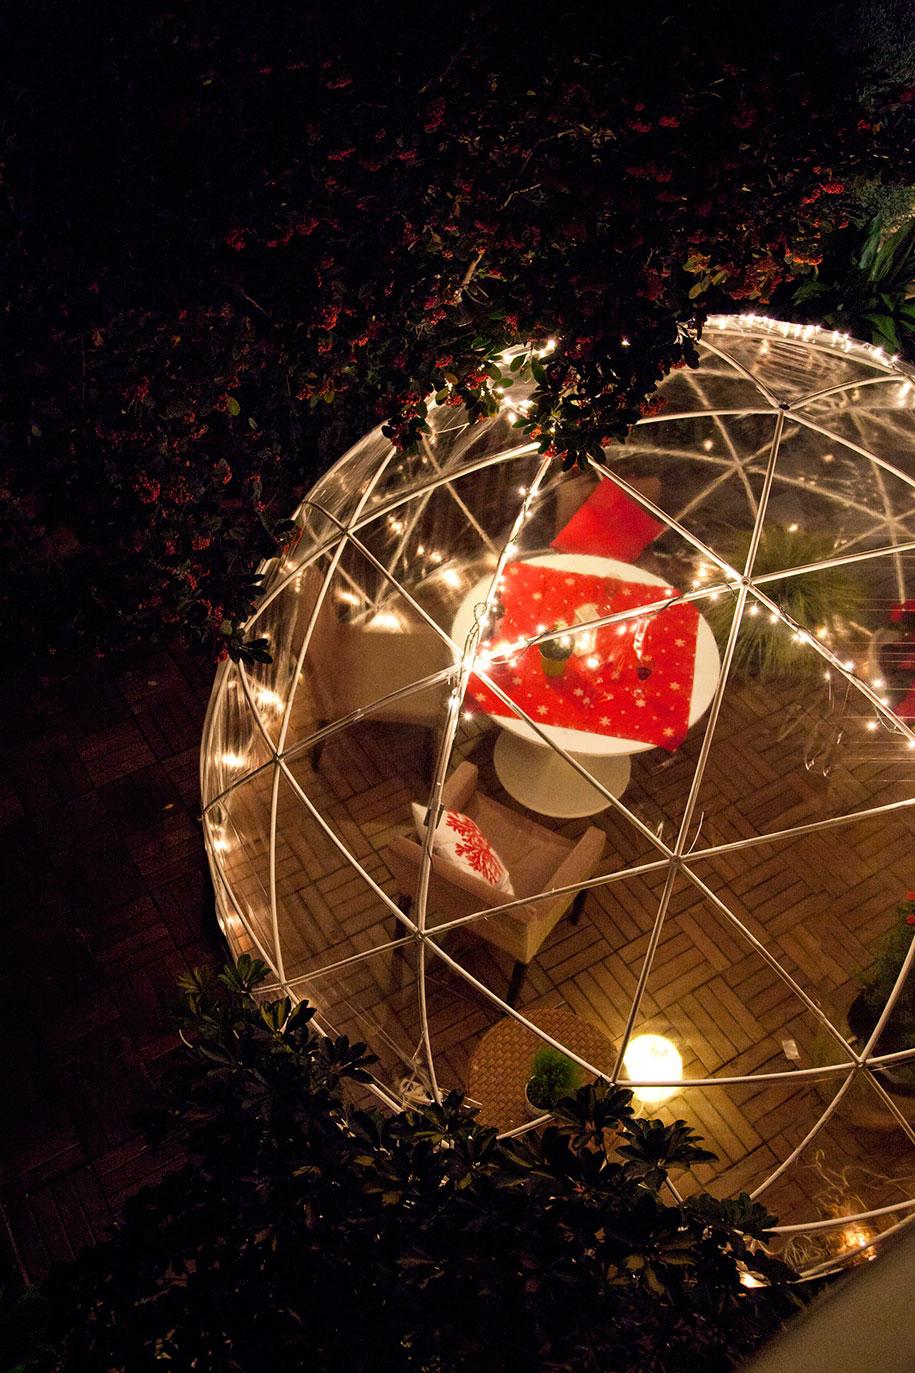 weatherproof-greenhouse-garden-igloos-gardenigloo-11